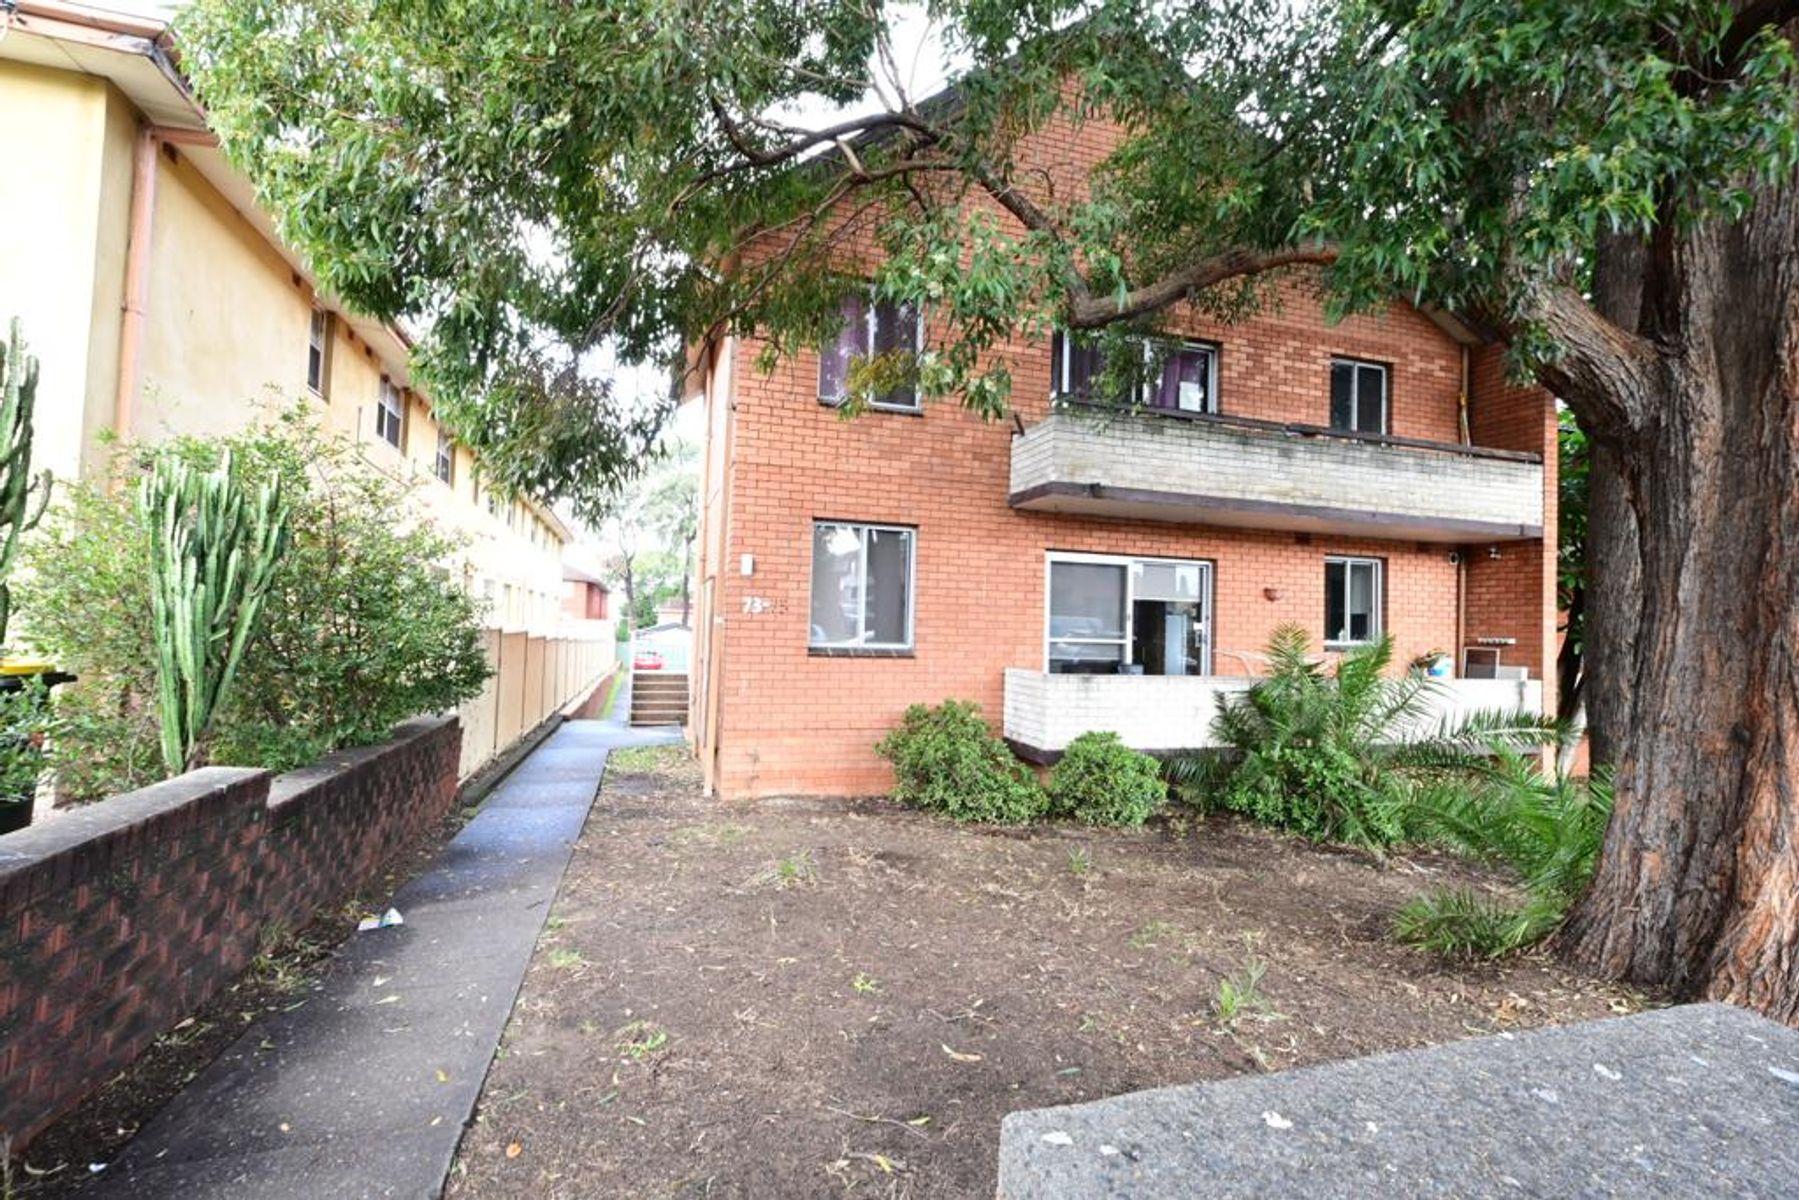 13/73-75 Northumberland Road, Auburn, NSW 2144